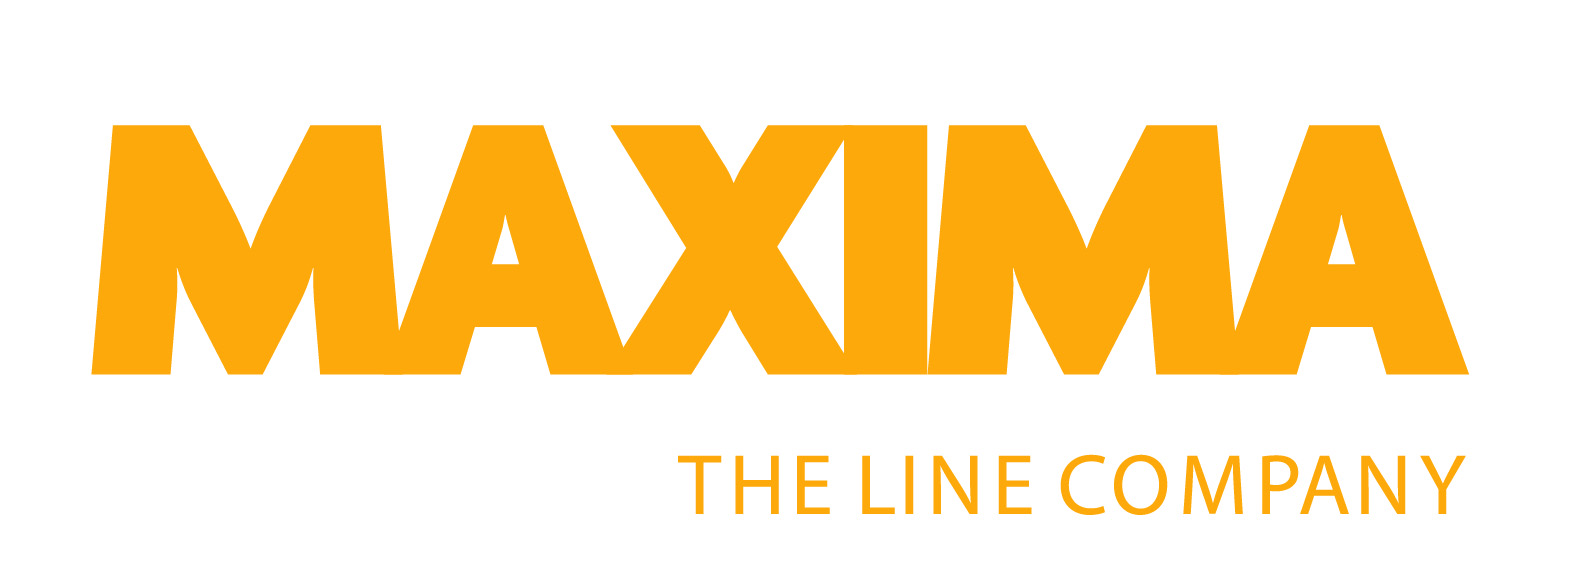 maxima_logos